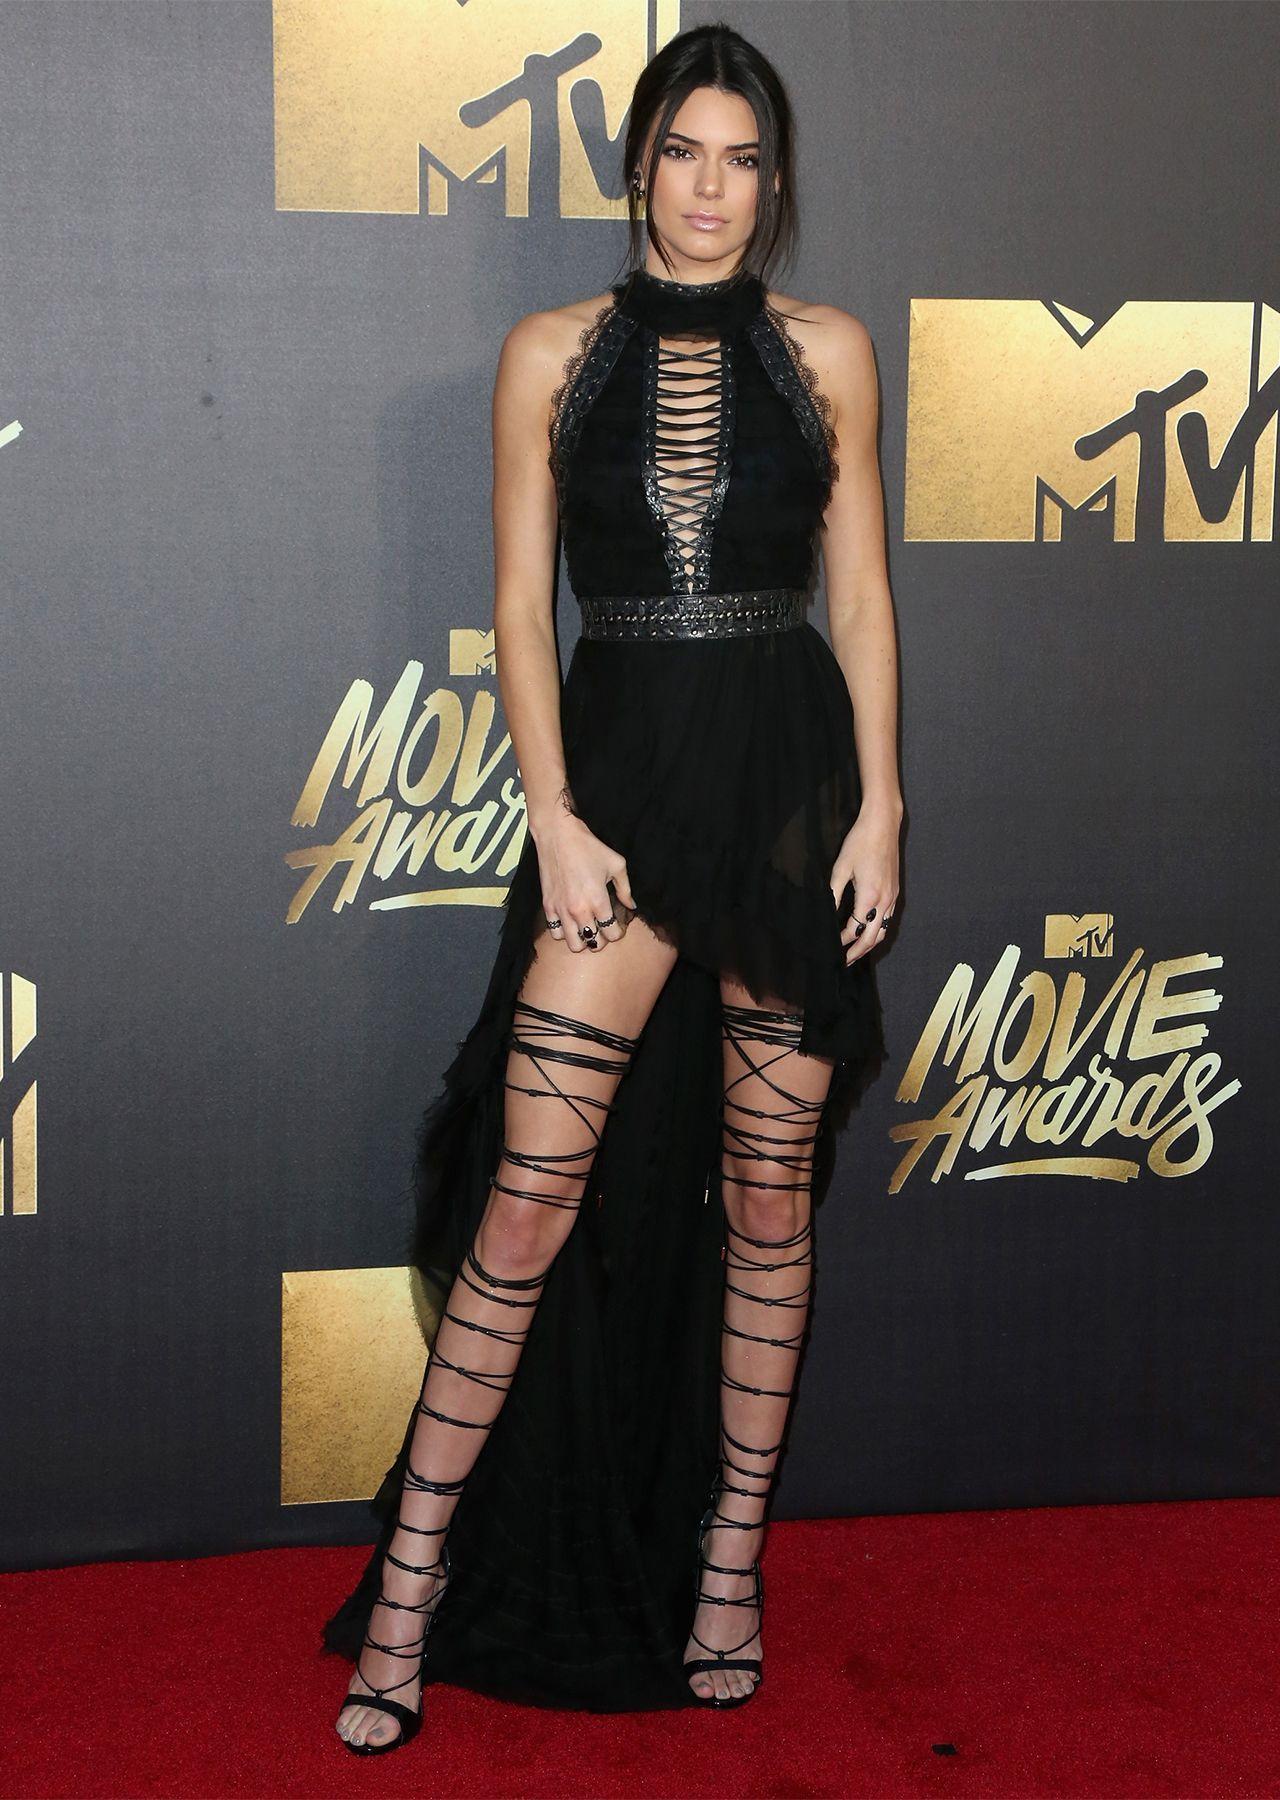 Celebrites Kendall Nicole Jenner nude photos 2019